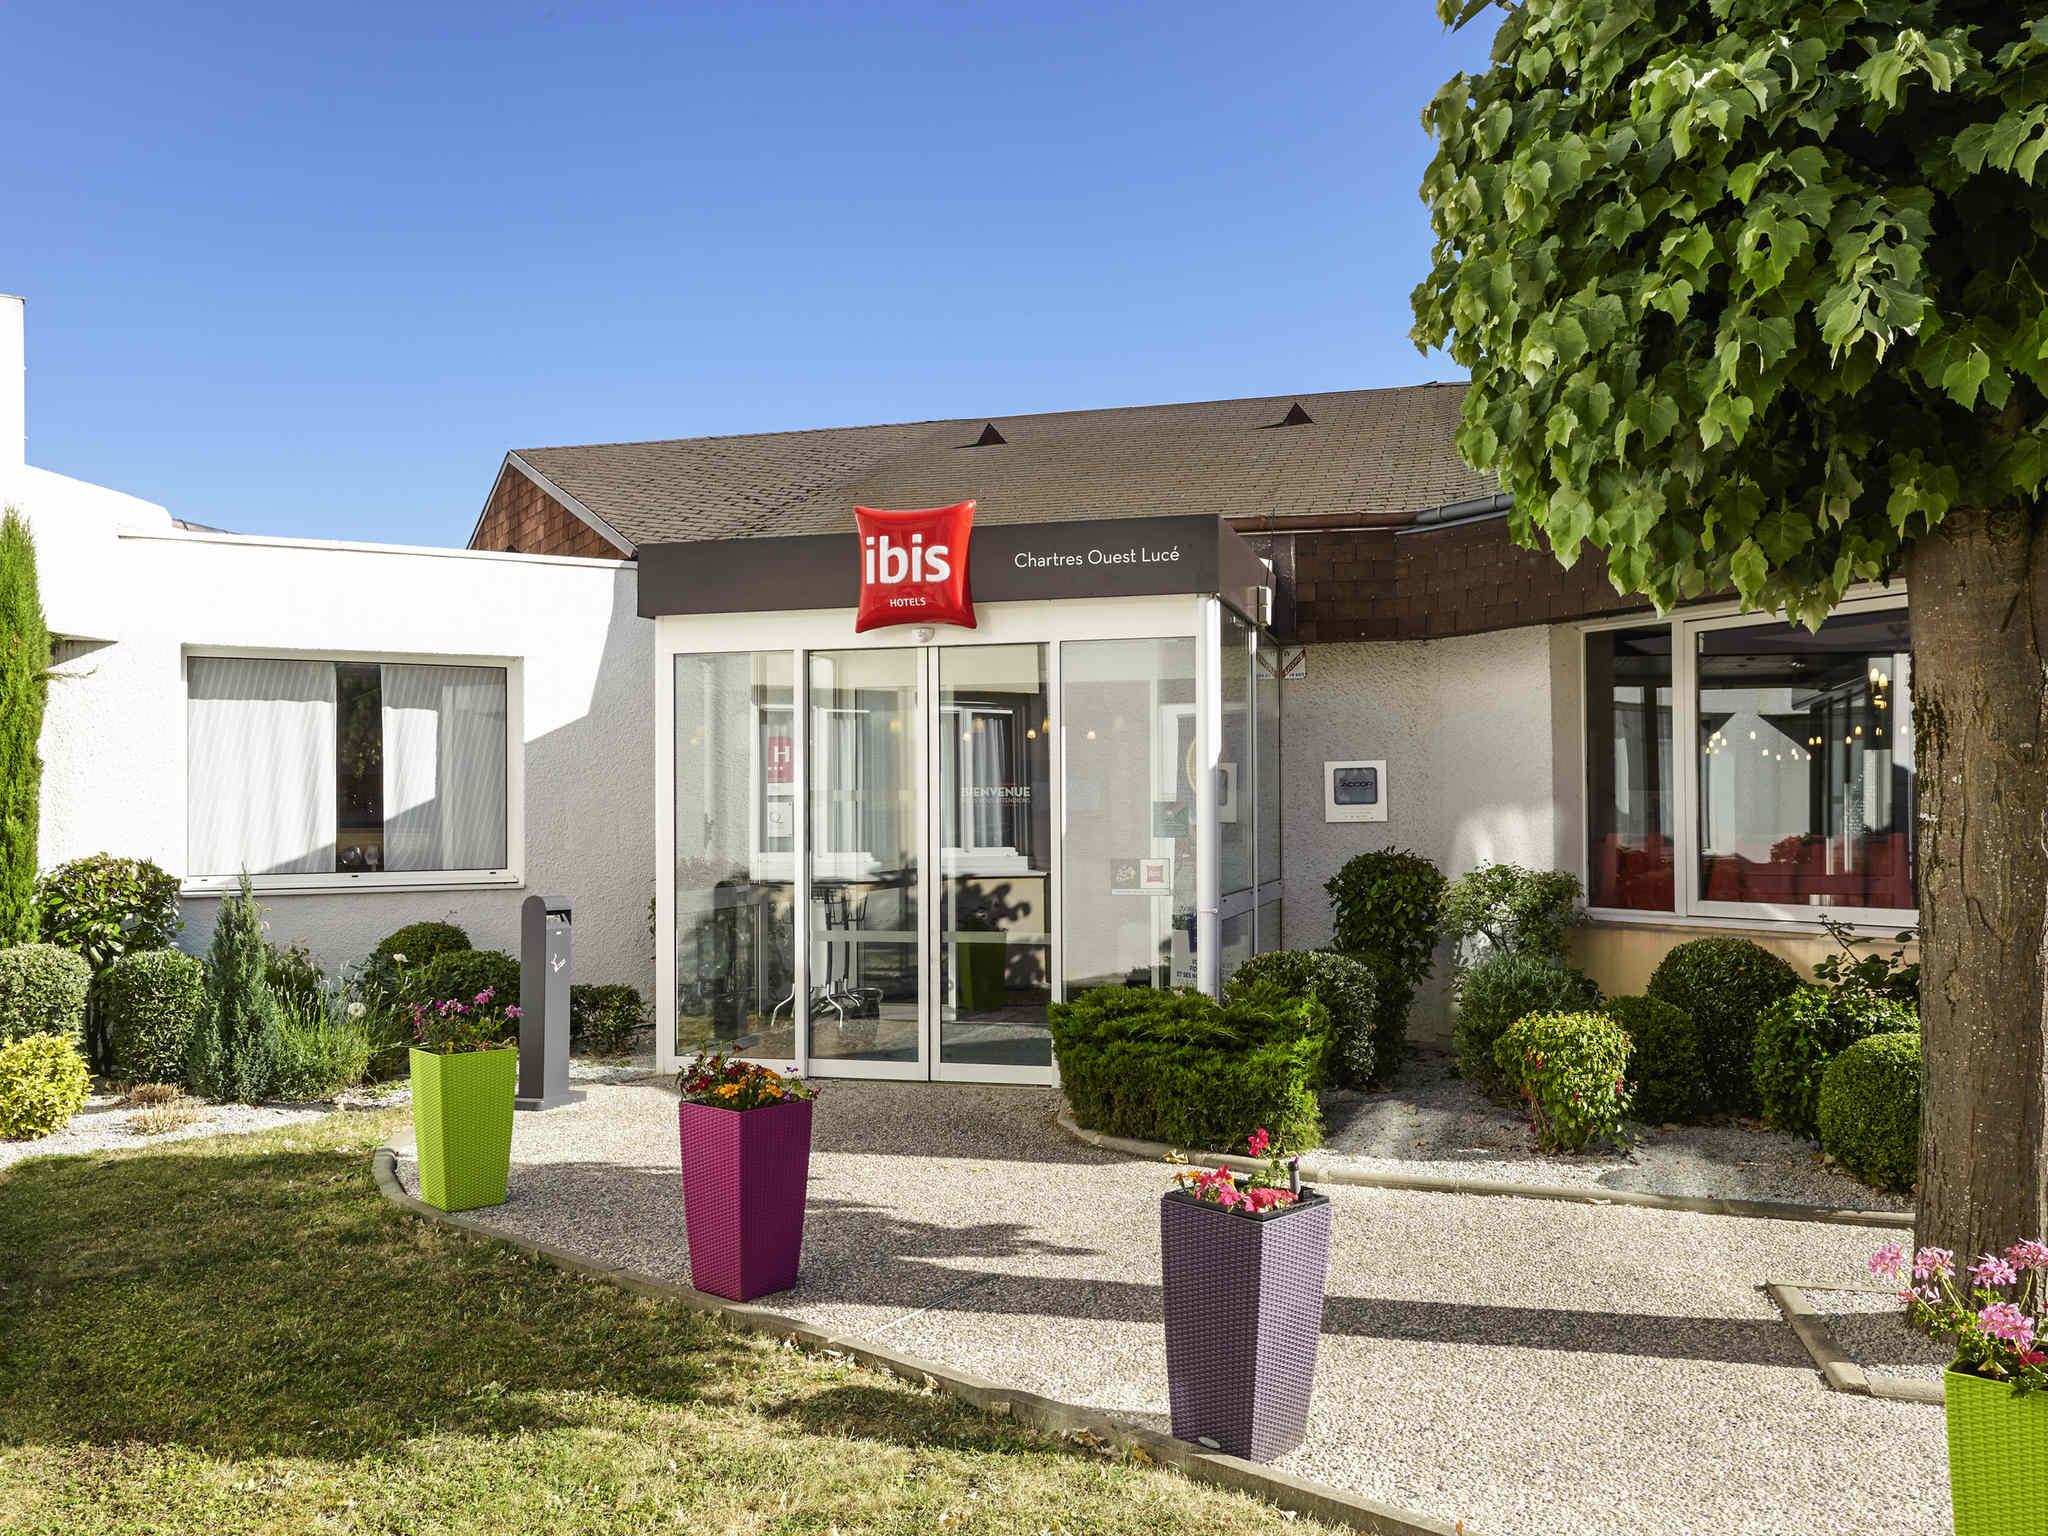 Отель — ibis Chartres Ouest Luce